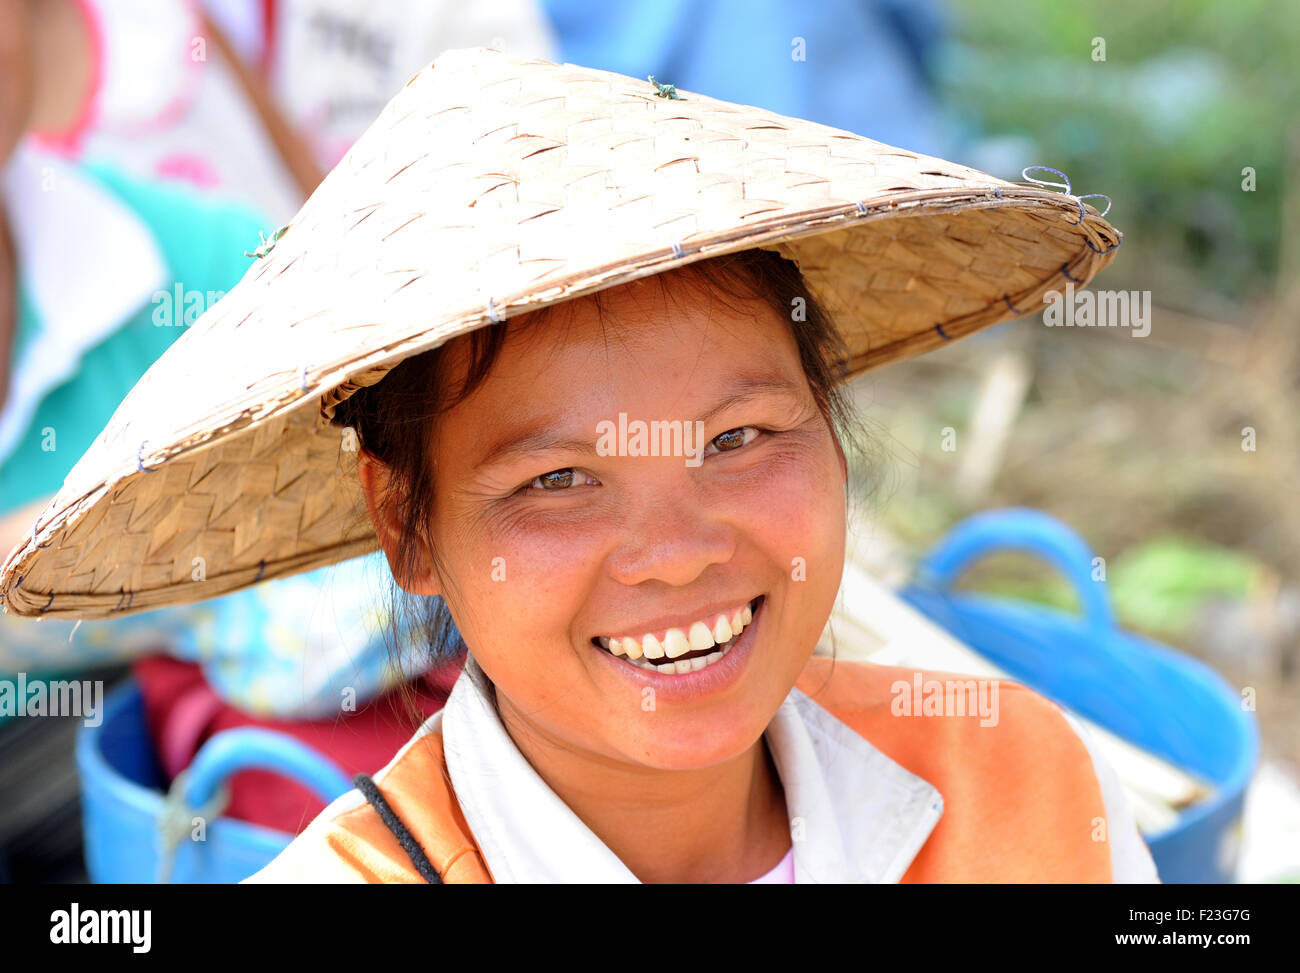 Lao woman at market, smiling. Luang Prabang, Laos Laotian - Stock Image